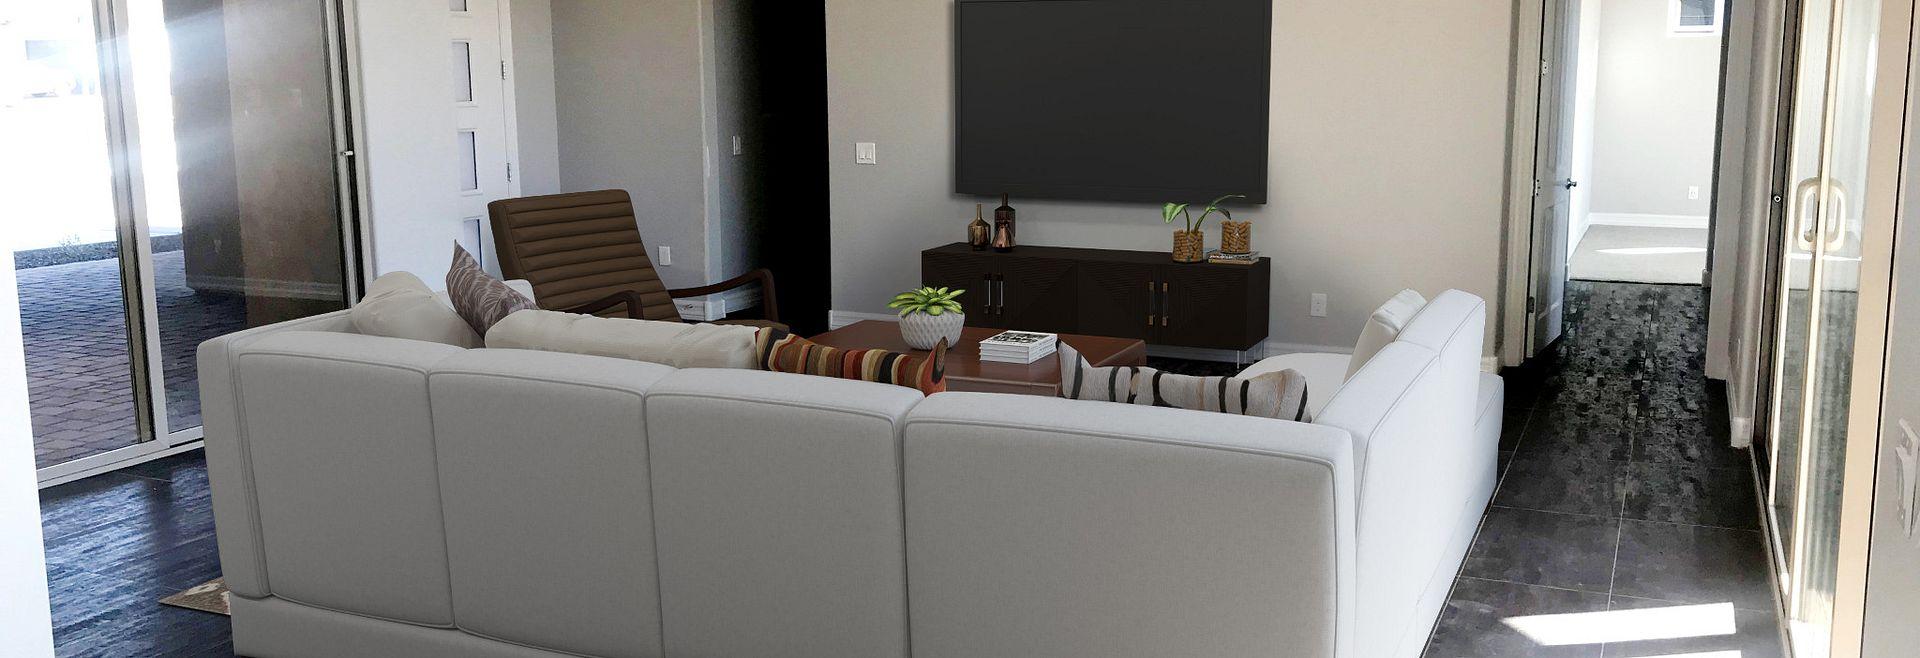 Origin Homesite 258 Great Room